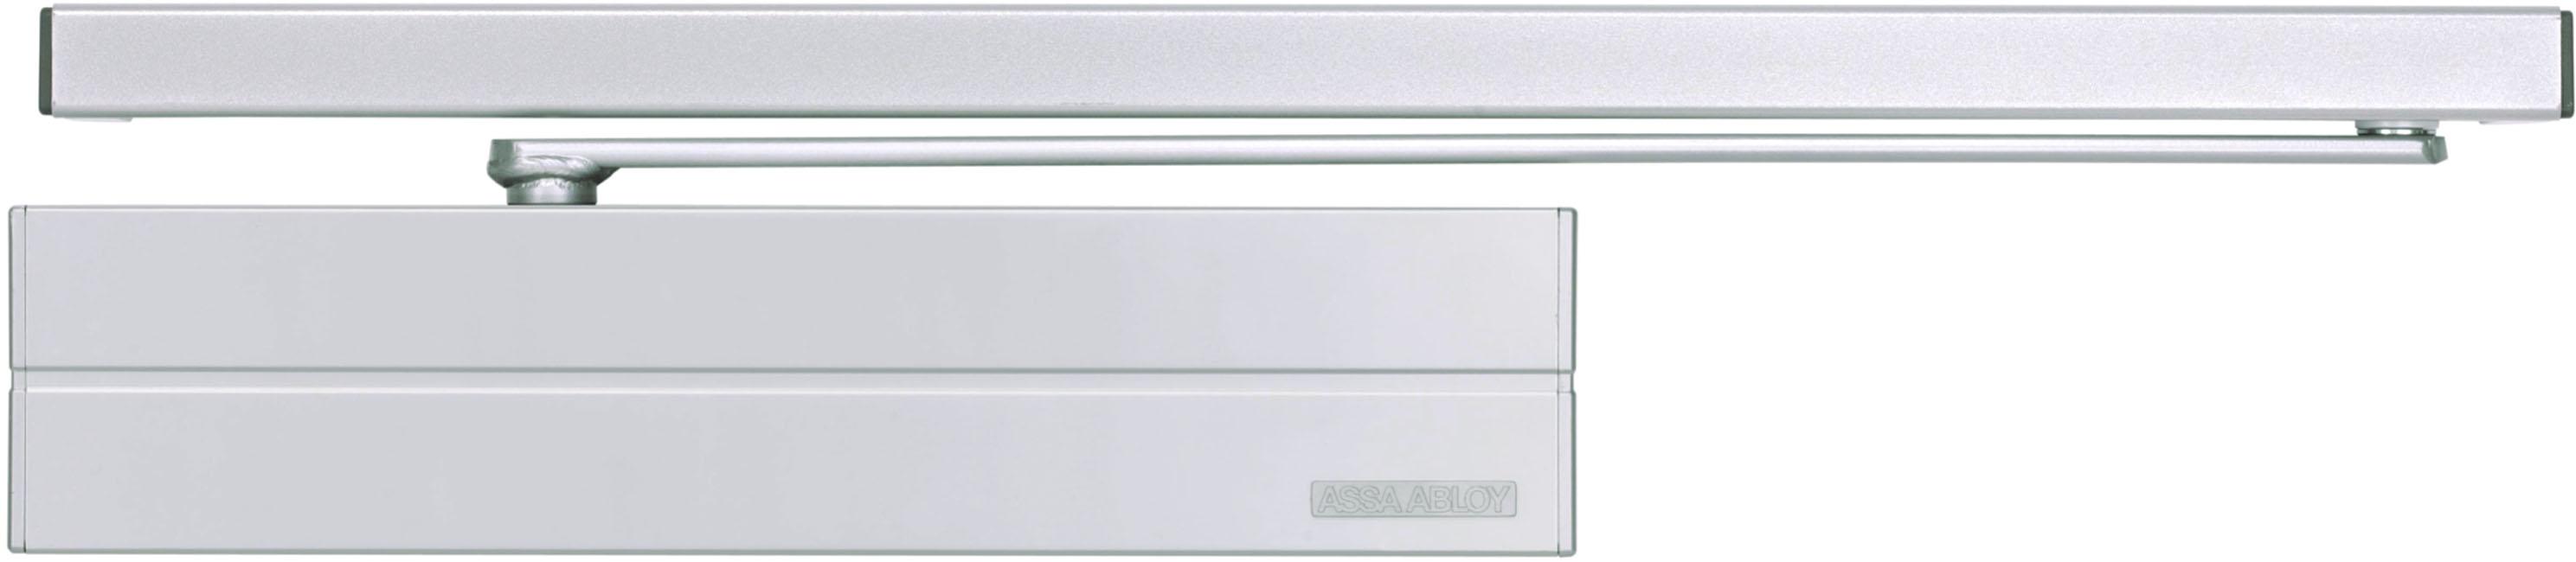 G195 + DC340 пример